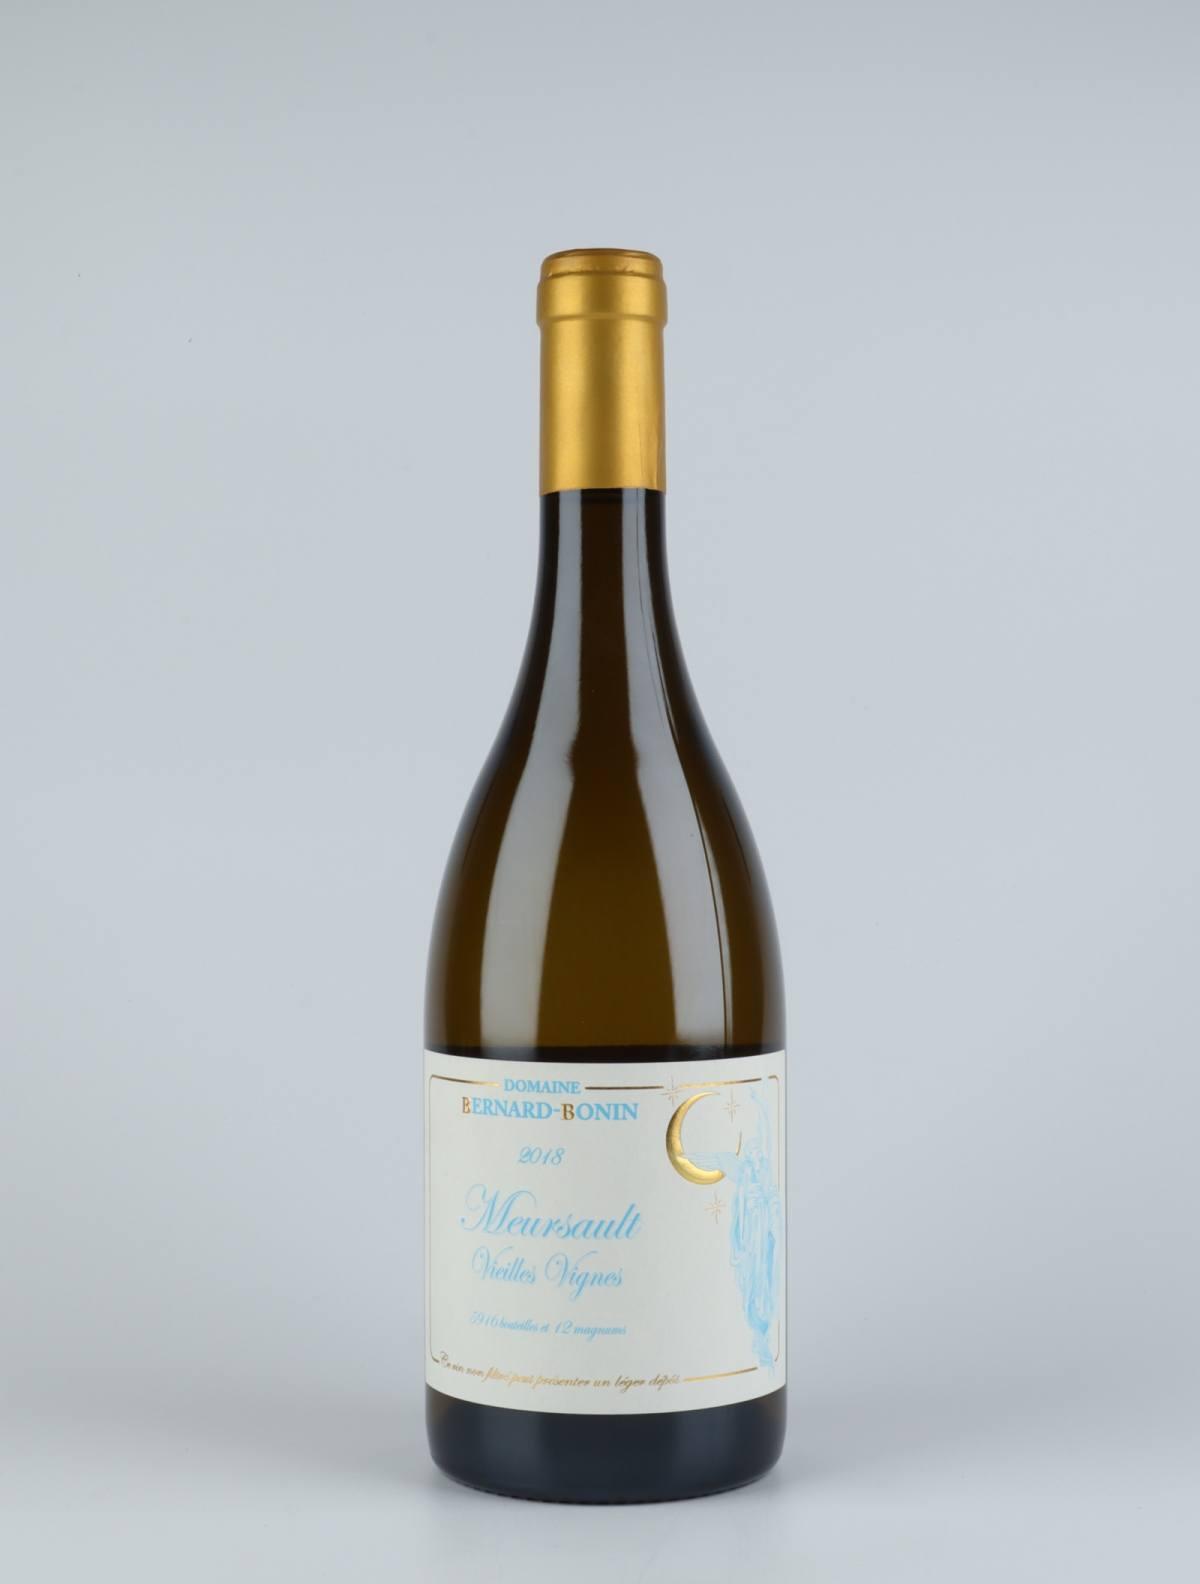 Meursault Vieilles Vignes